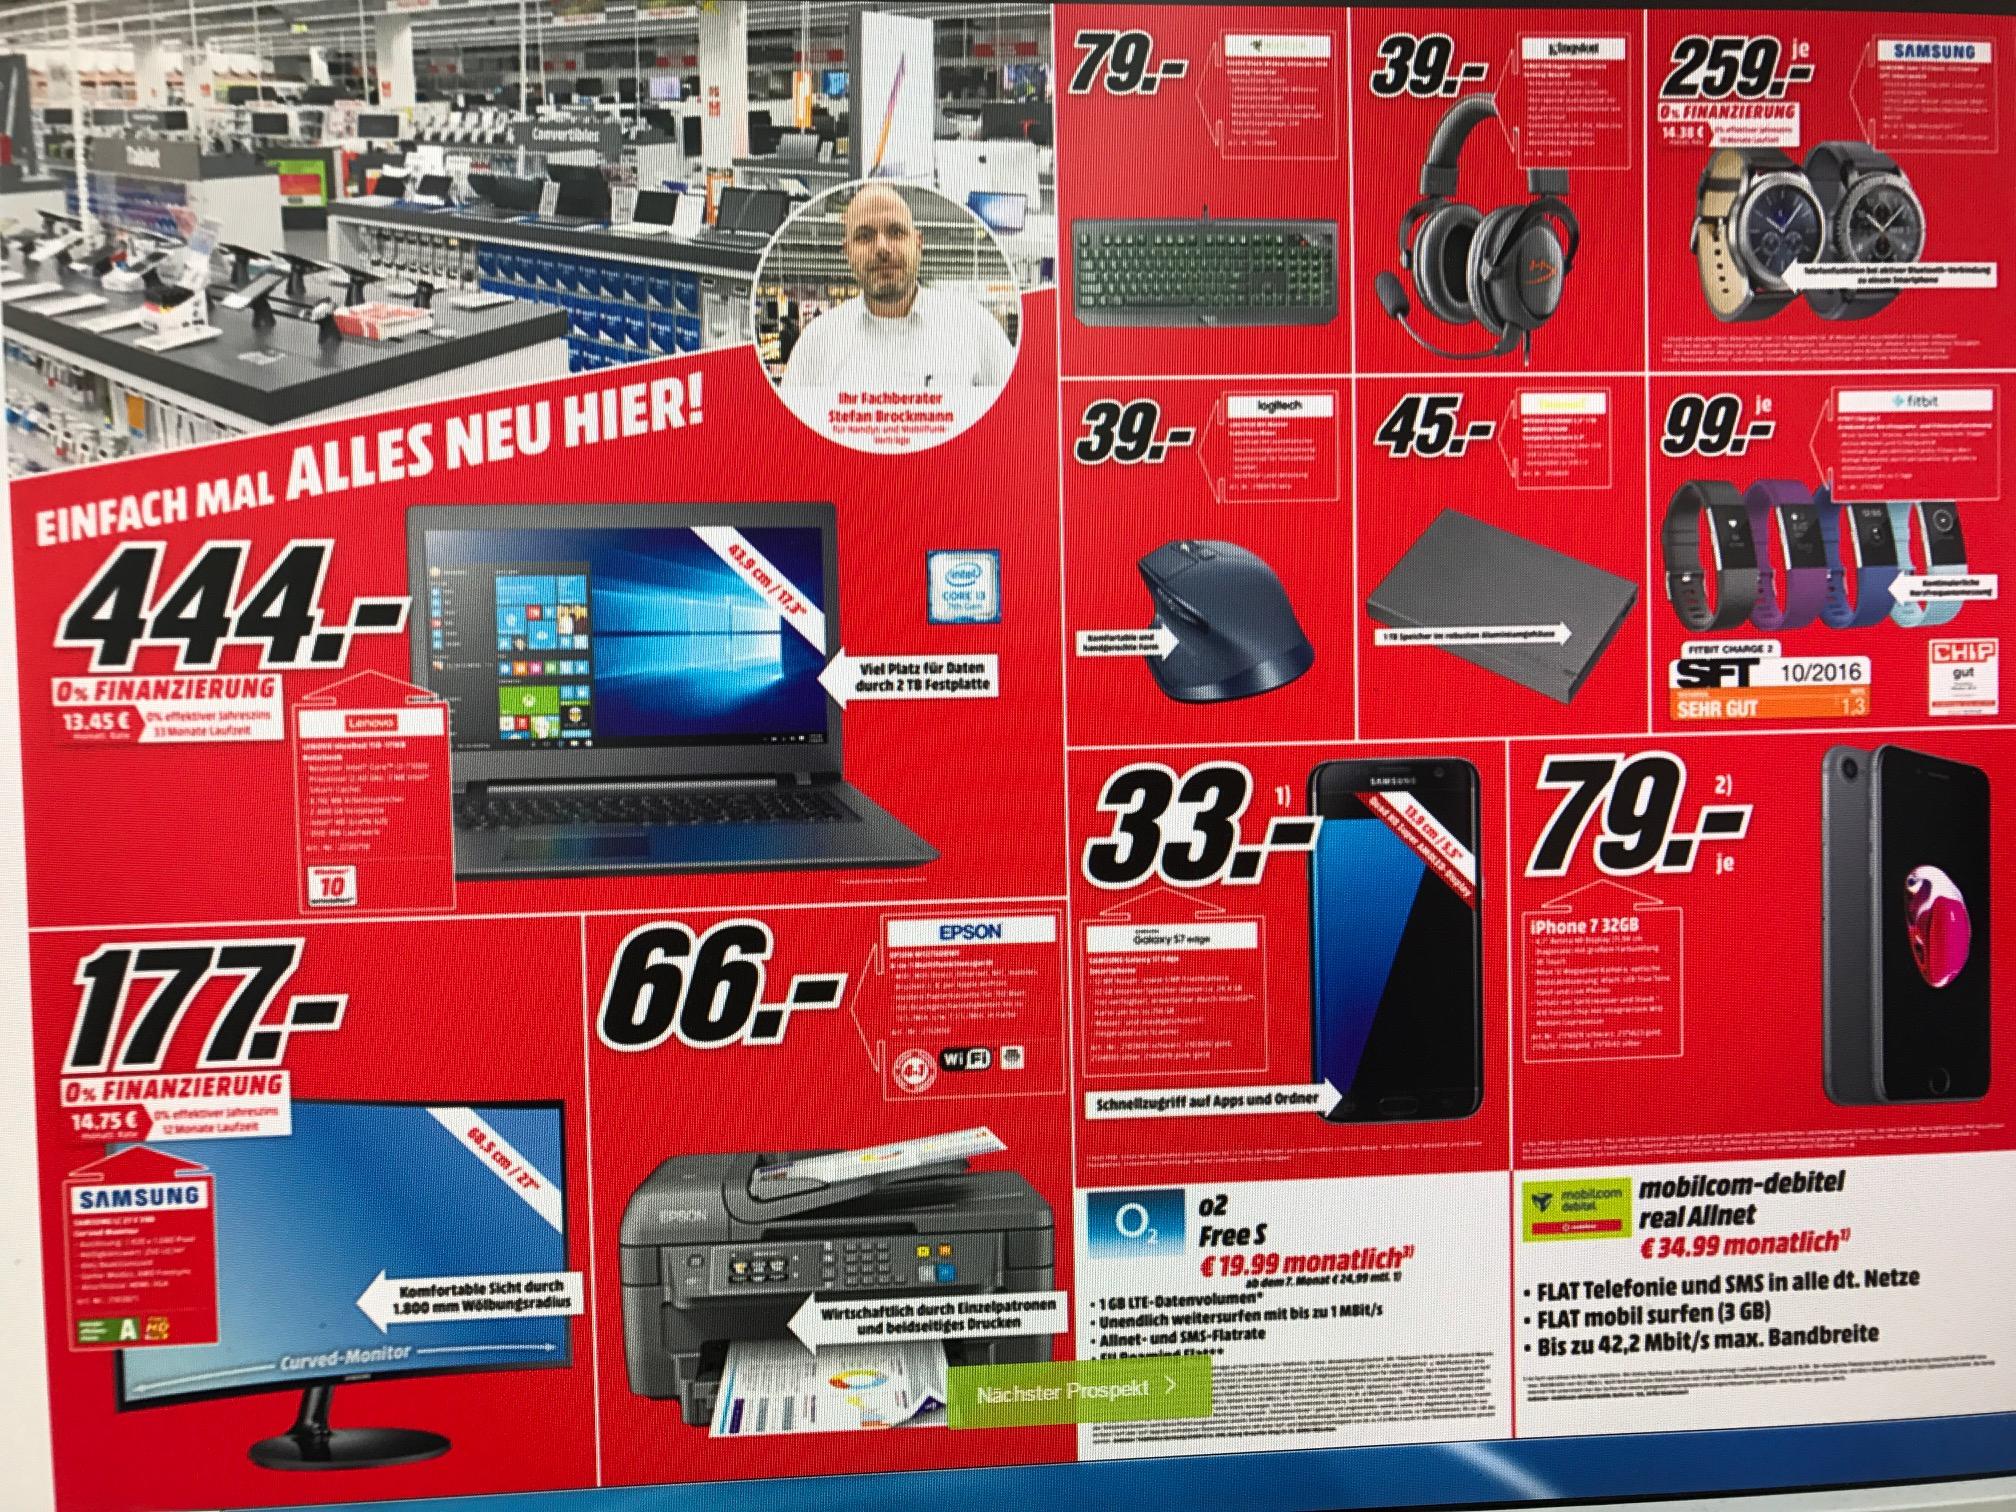 (Lokal Bremen) Sammeldeal MX Master 39,- FitBit Charge 2 99,- HyperX Cloud Core 39,- Samsung Gear S3 259,-